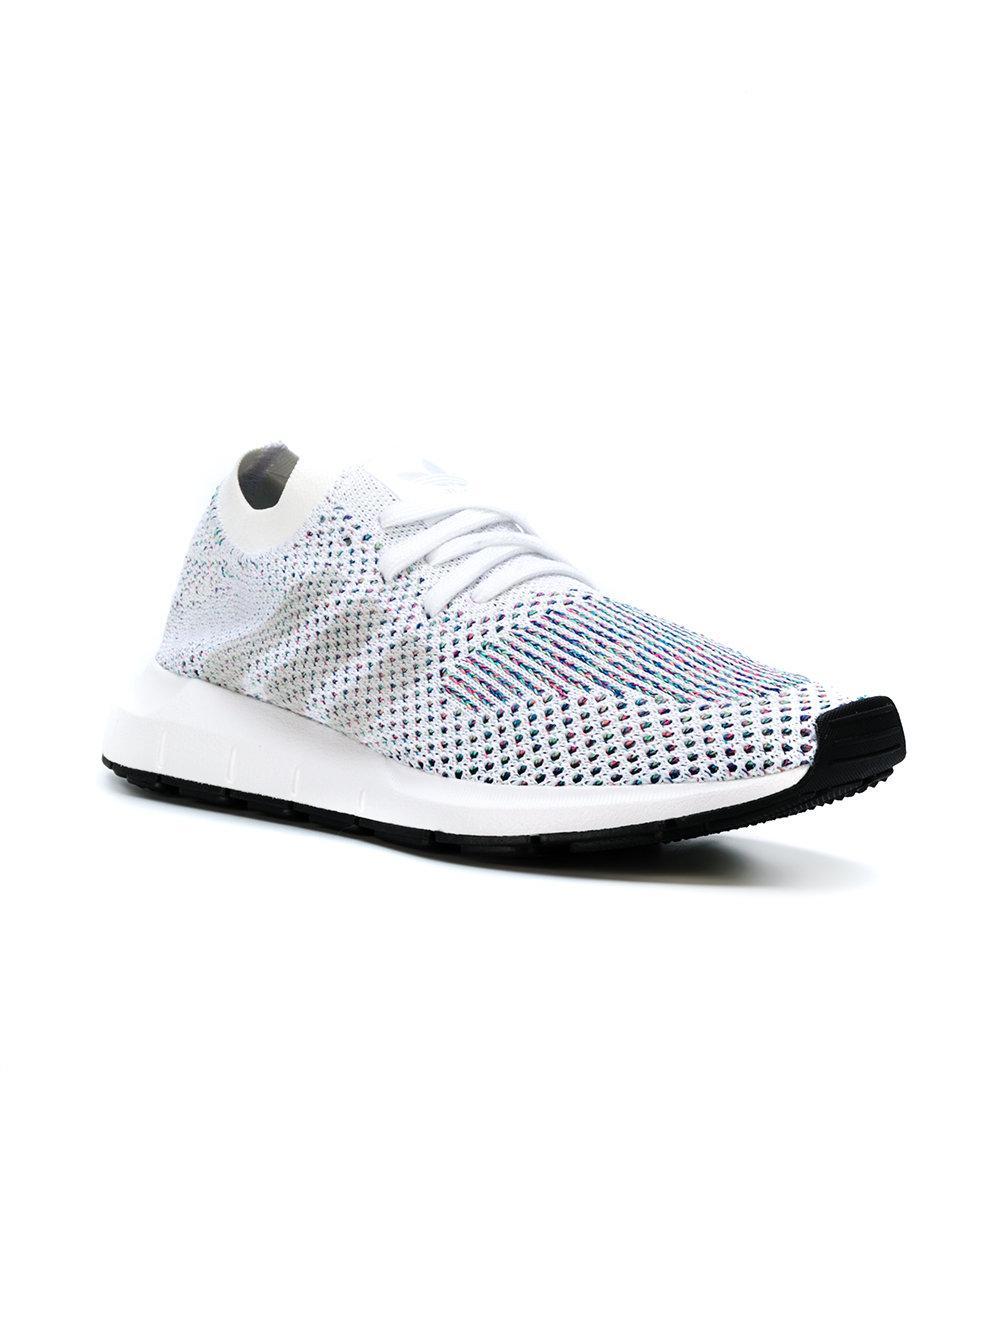 Lyst Adidas Originali Swift Run Primeknit Scarpe Bianche